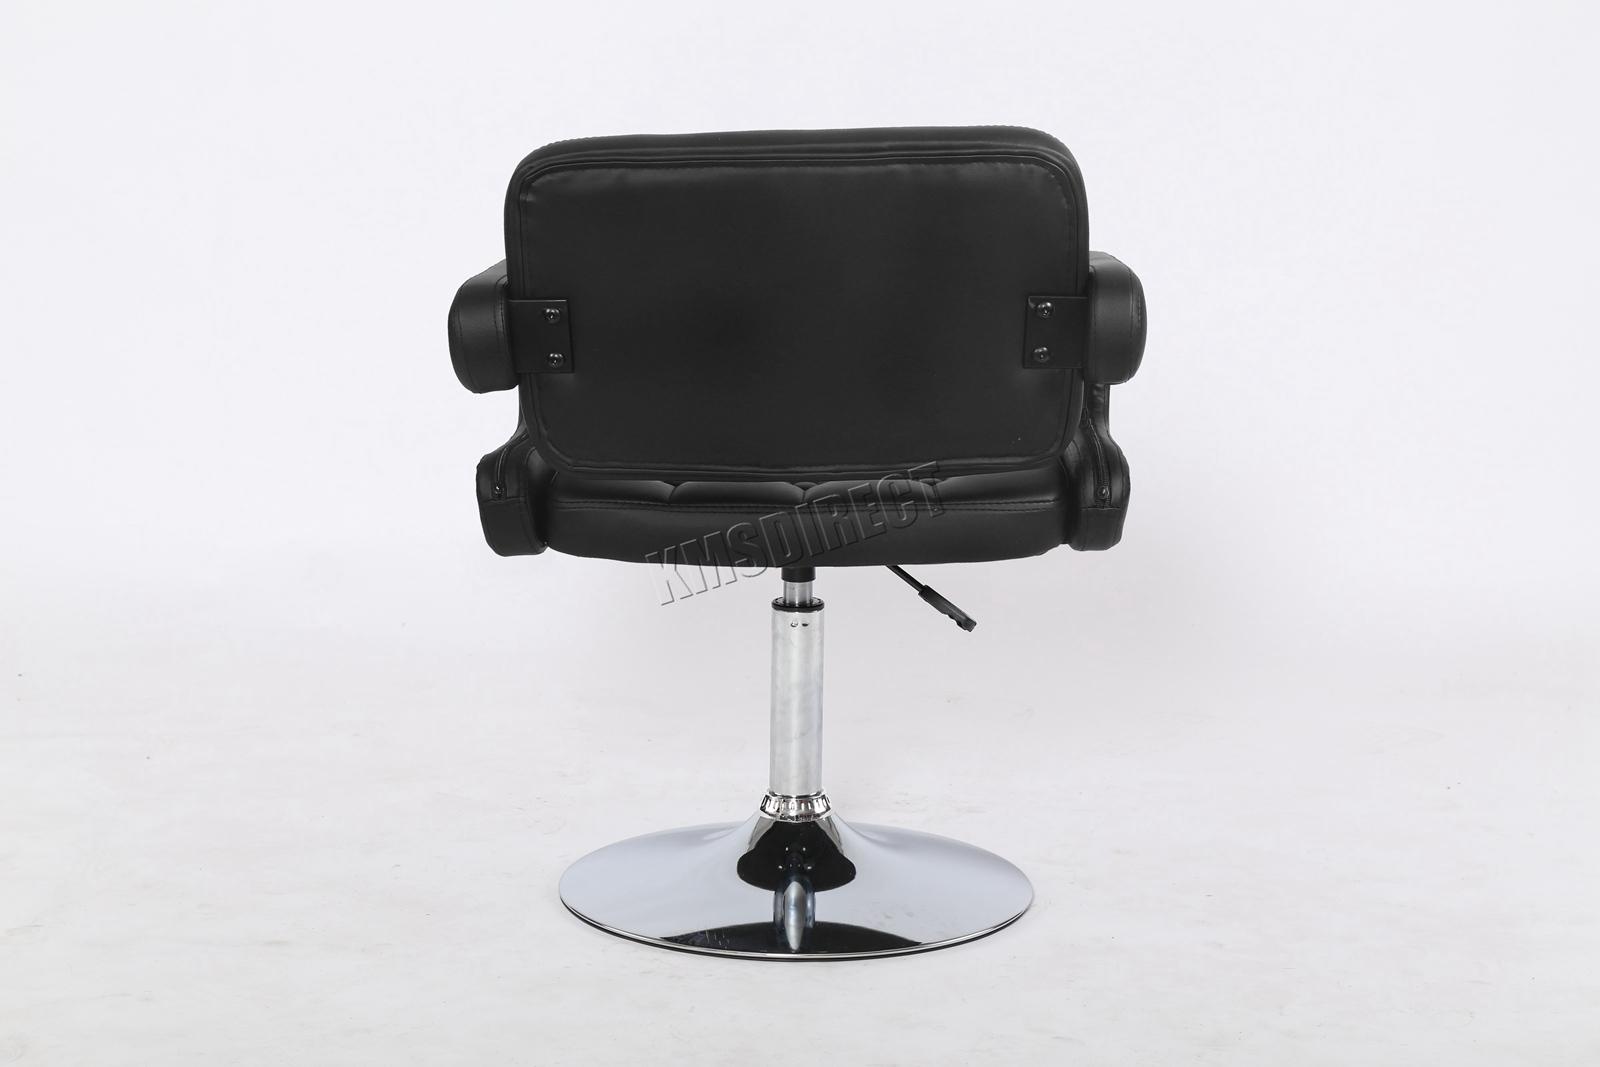 WestWood-Beauty-Salon-Chair-Barber-Hairdressing-Hair-Cut-PU-Leather-Modern-SC02 miniatuur 16